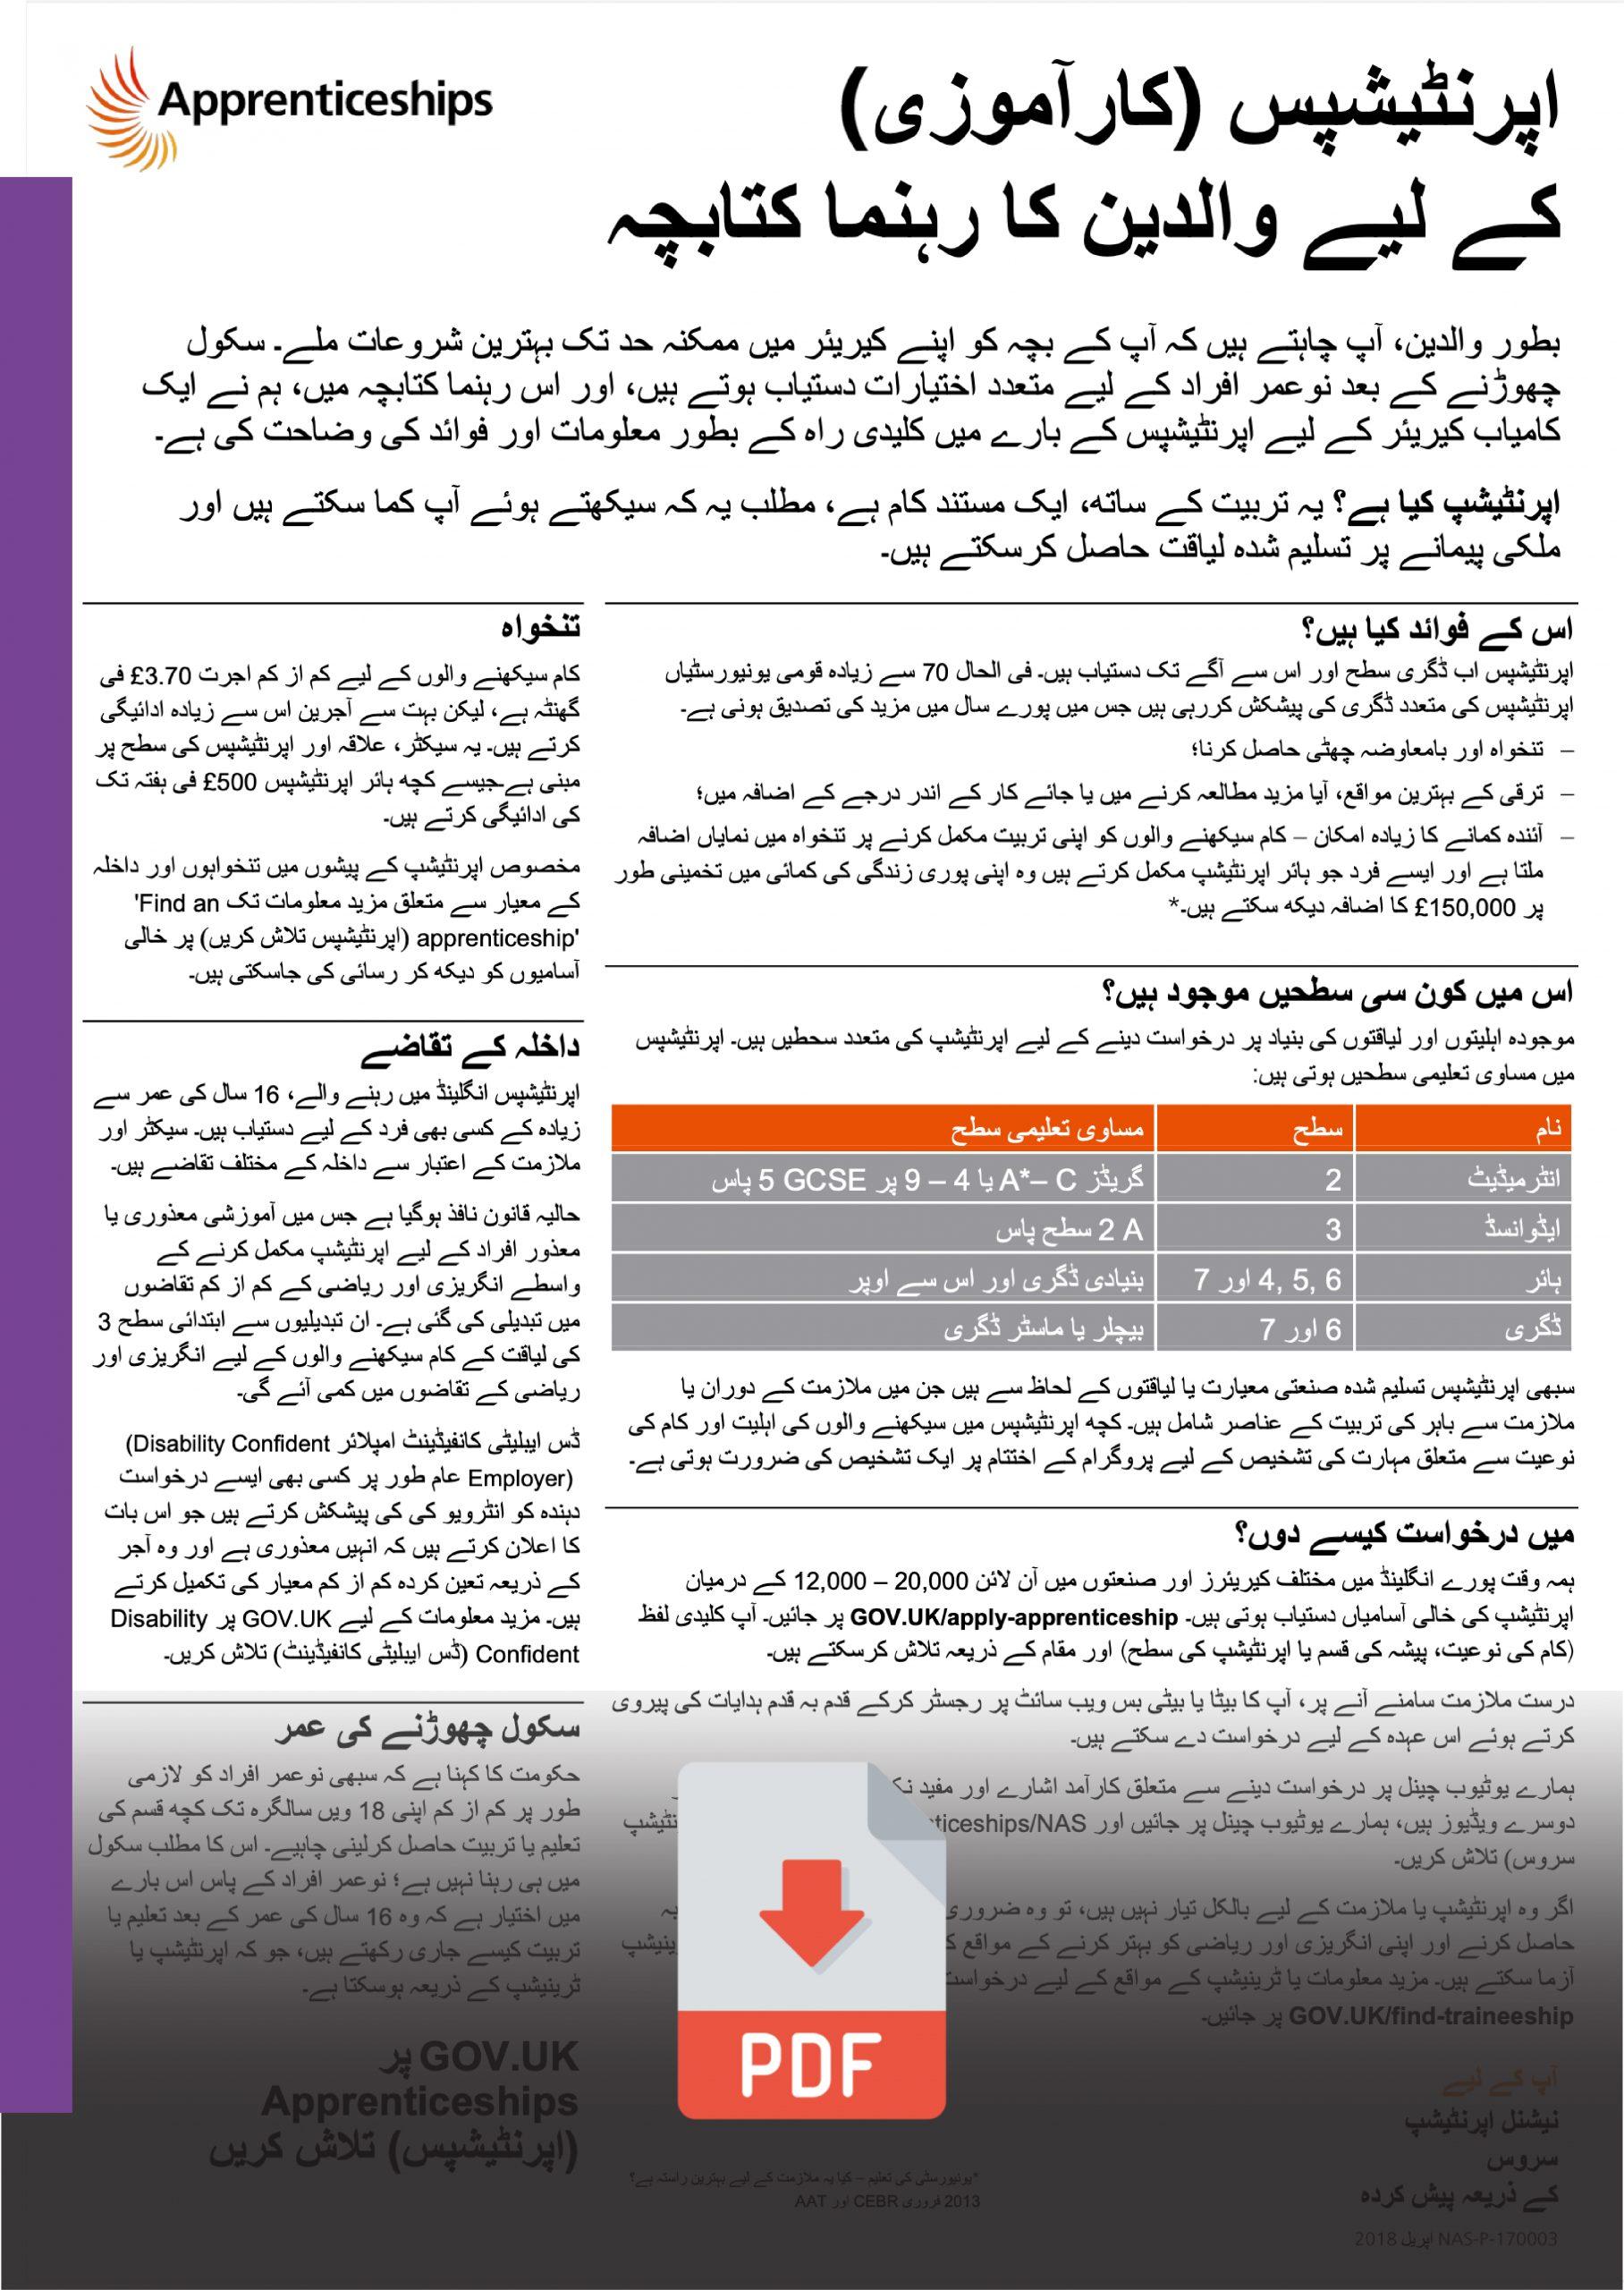 Urdu - Parents Guide to Apprenticeships